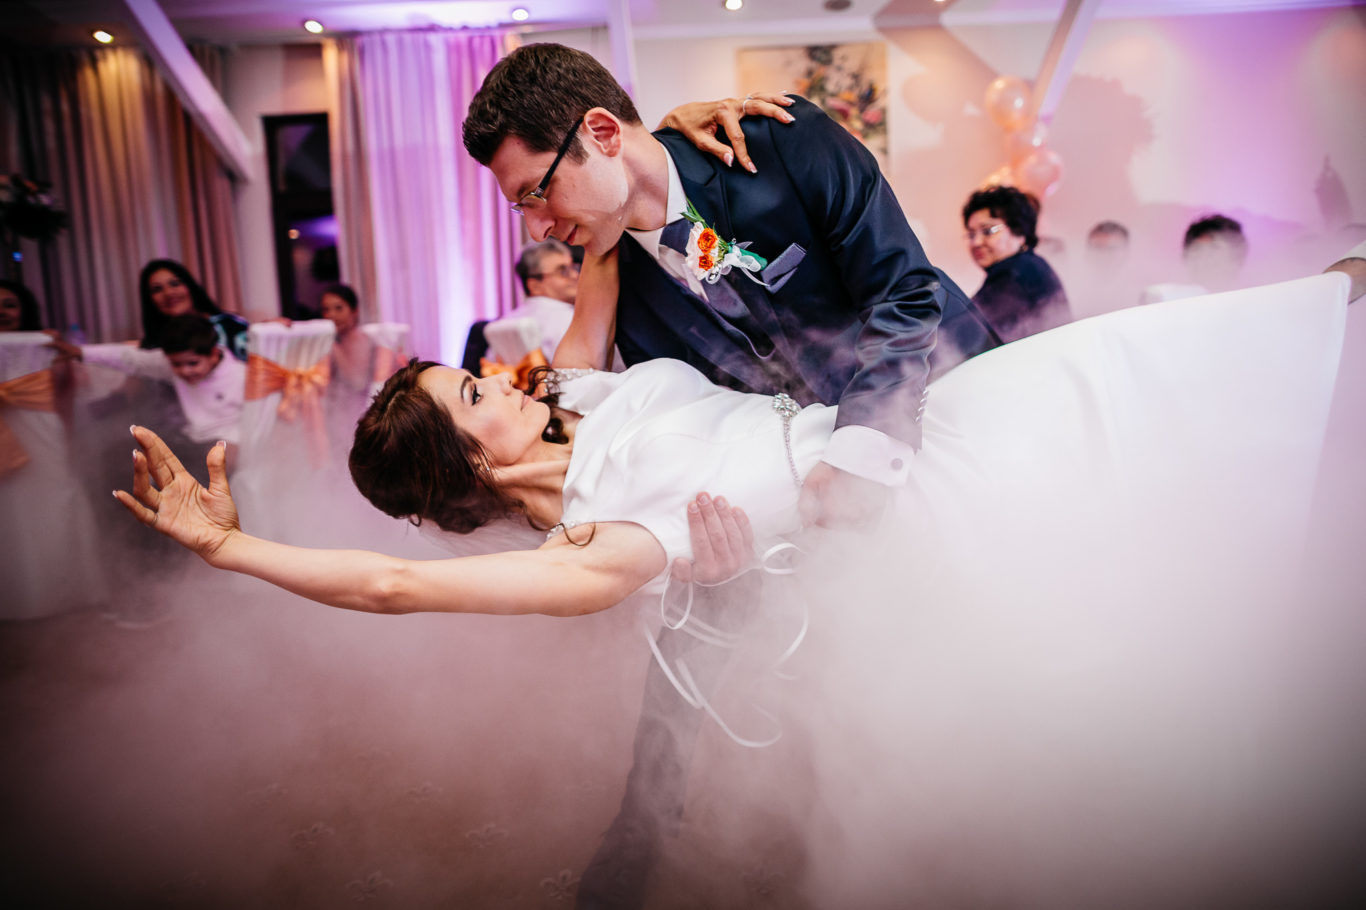 0668-fotografie-nunta-bucuresti-dana-radu-fotograf-ciprian-dumitrescu-dc1_4220